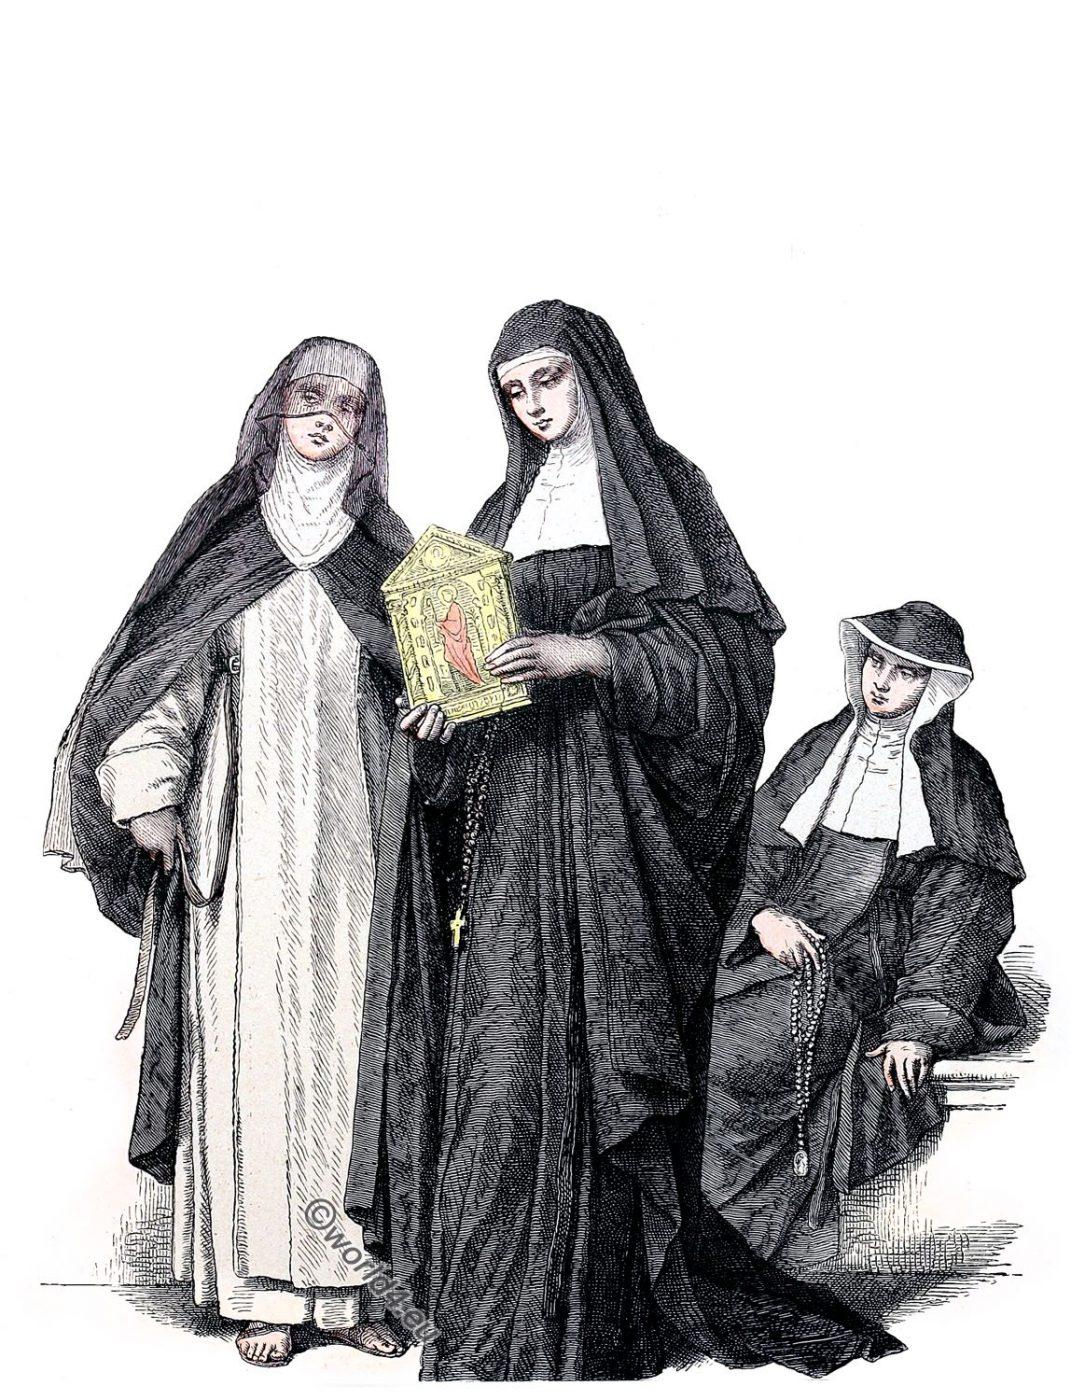 Augustinian, nuns, habit, monastic order